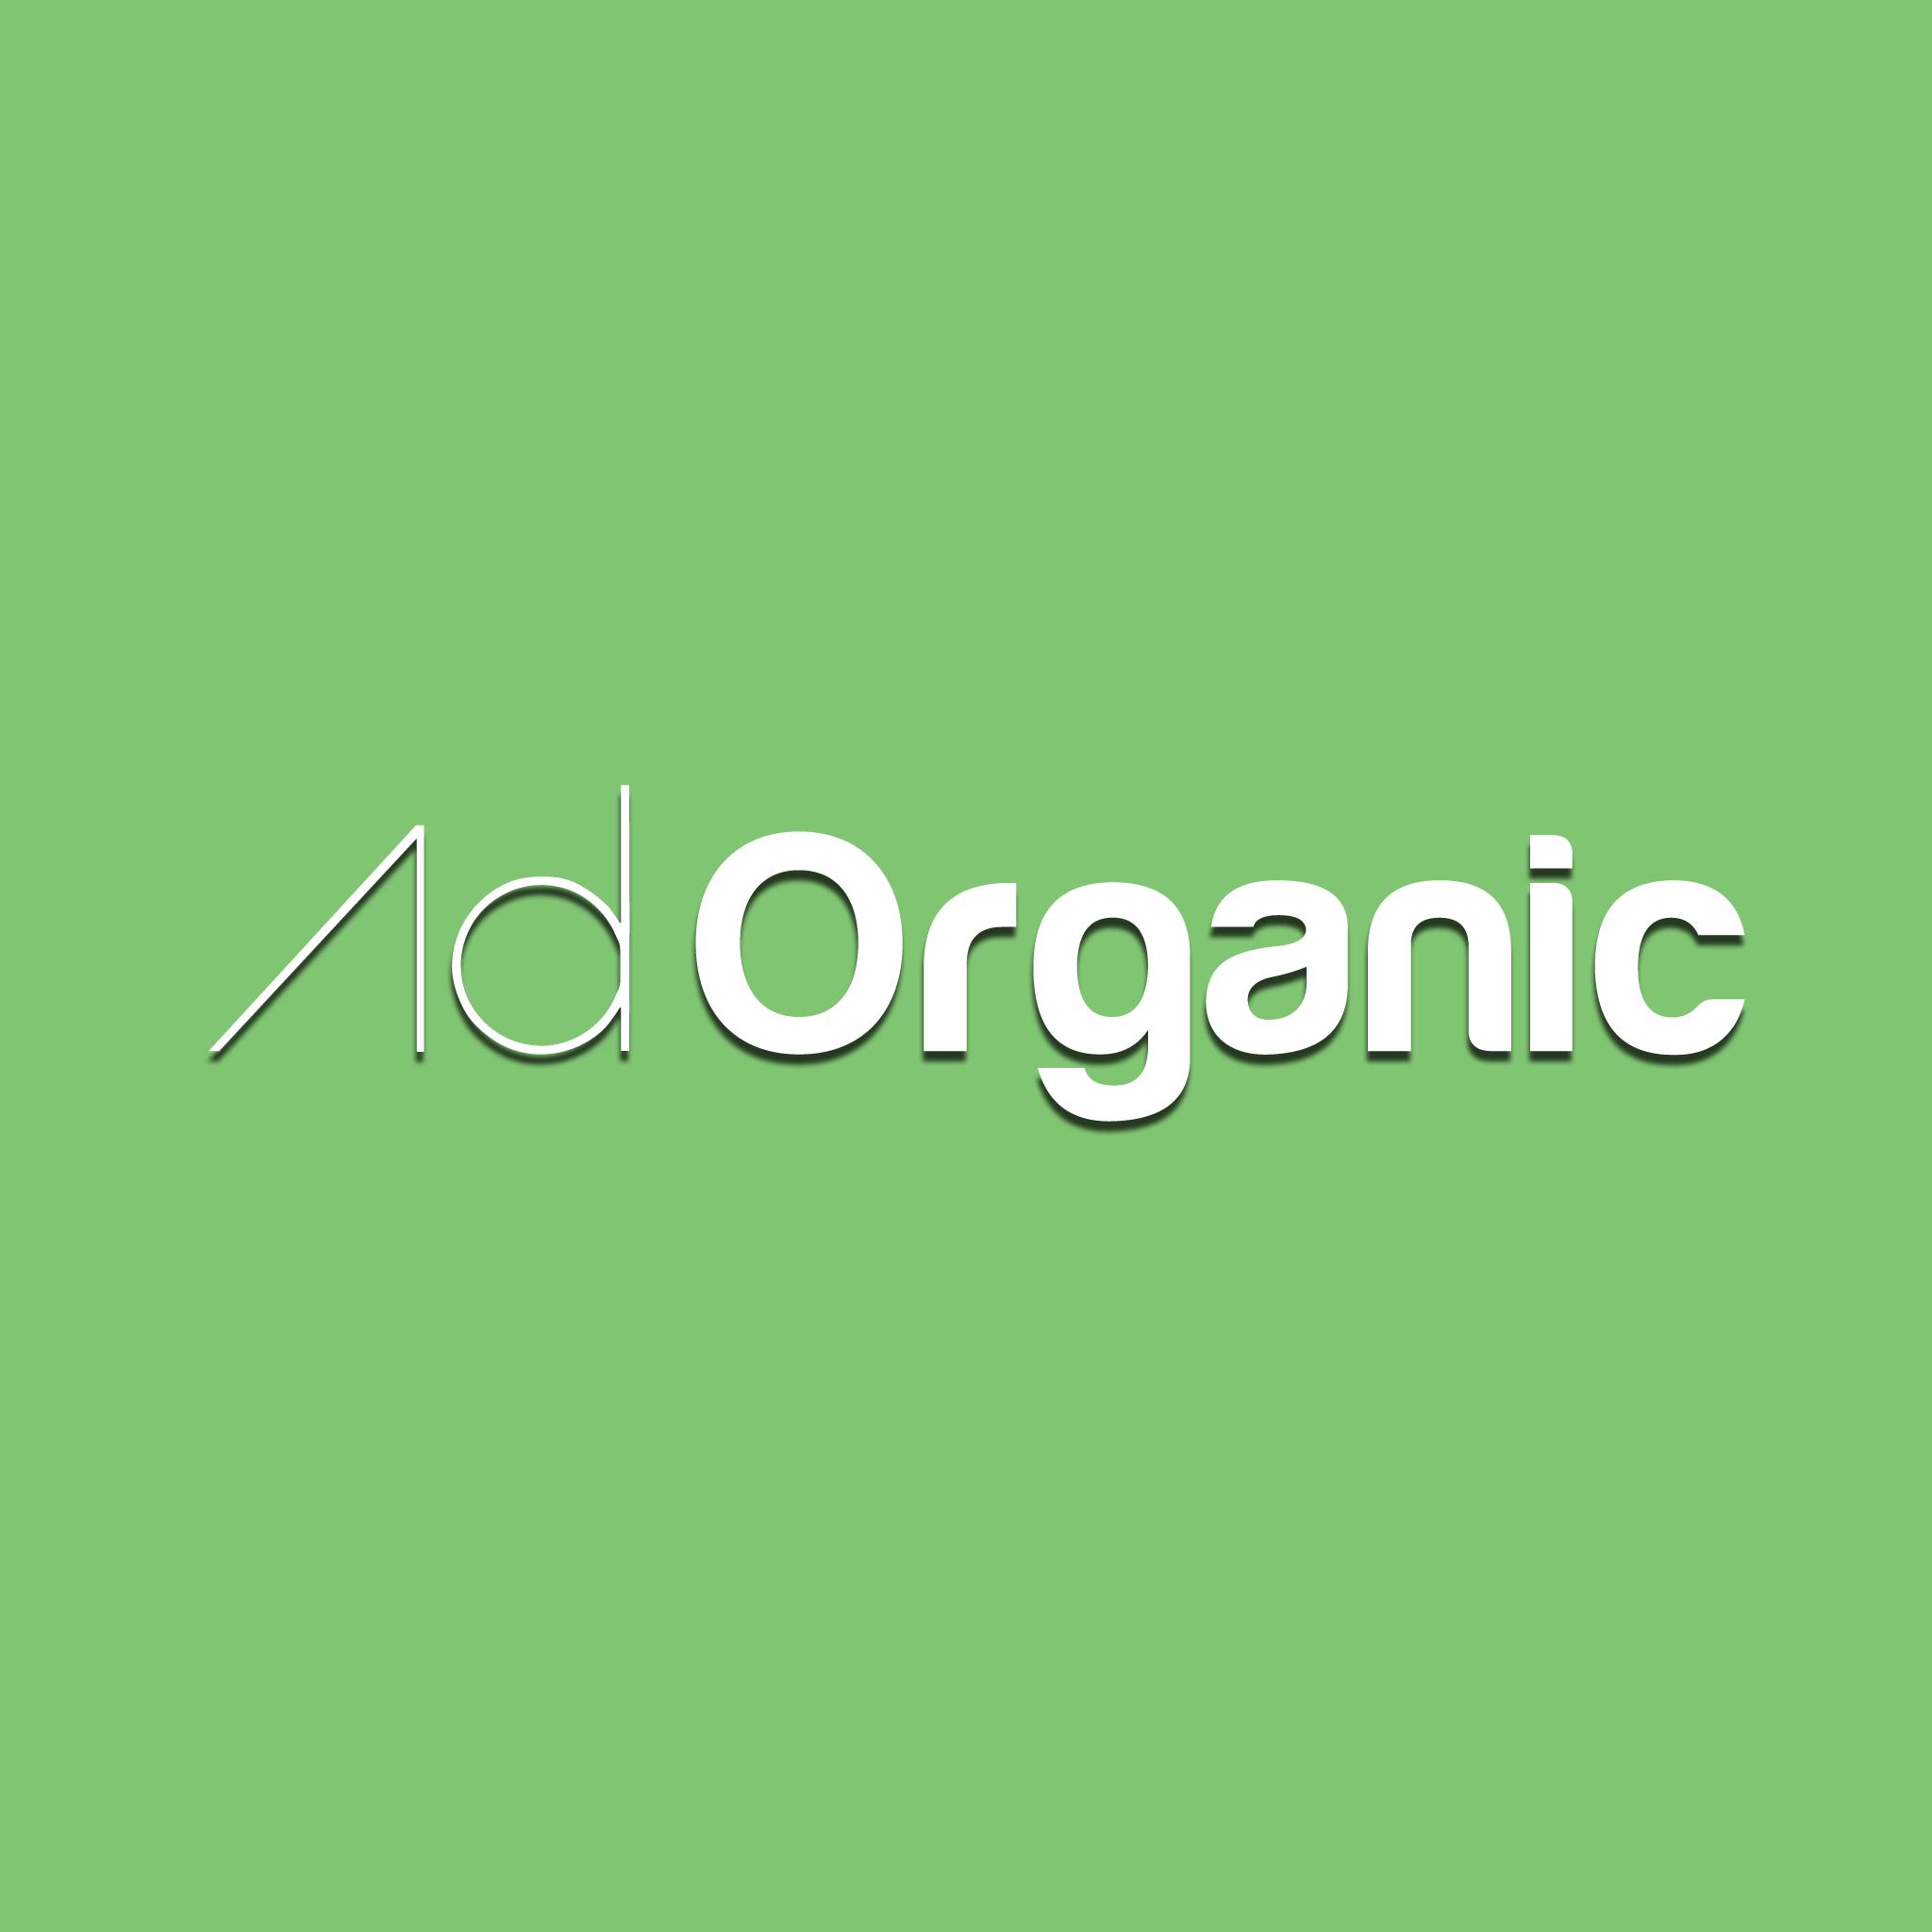 AdOrganic Web Design Logo